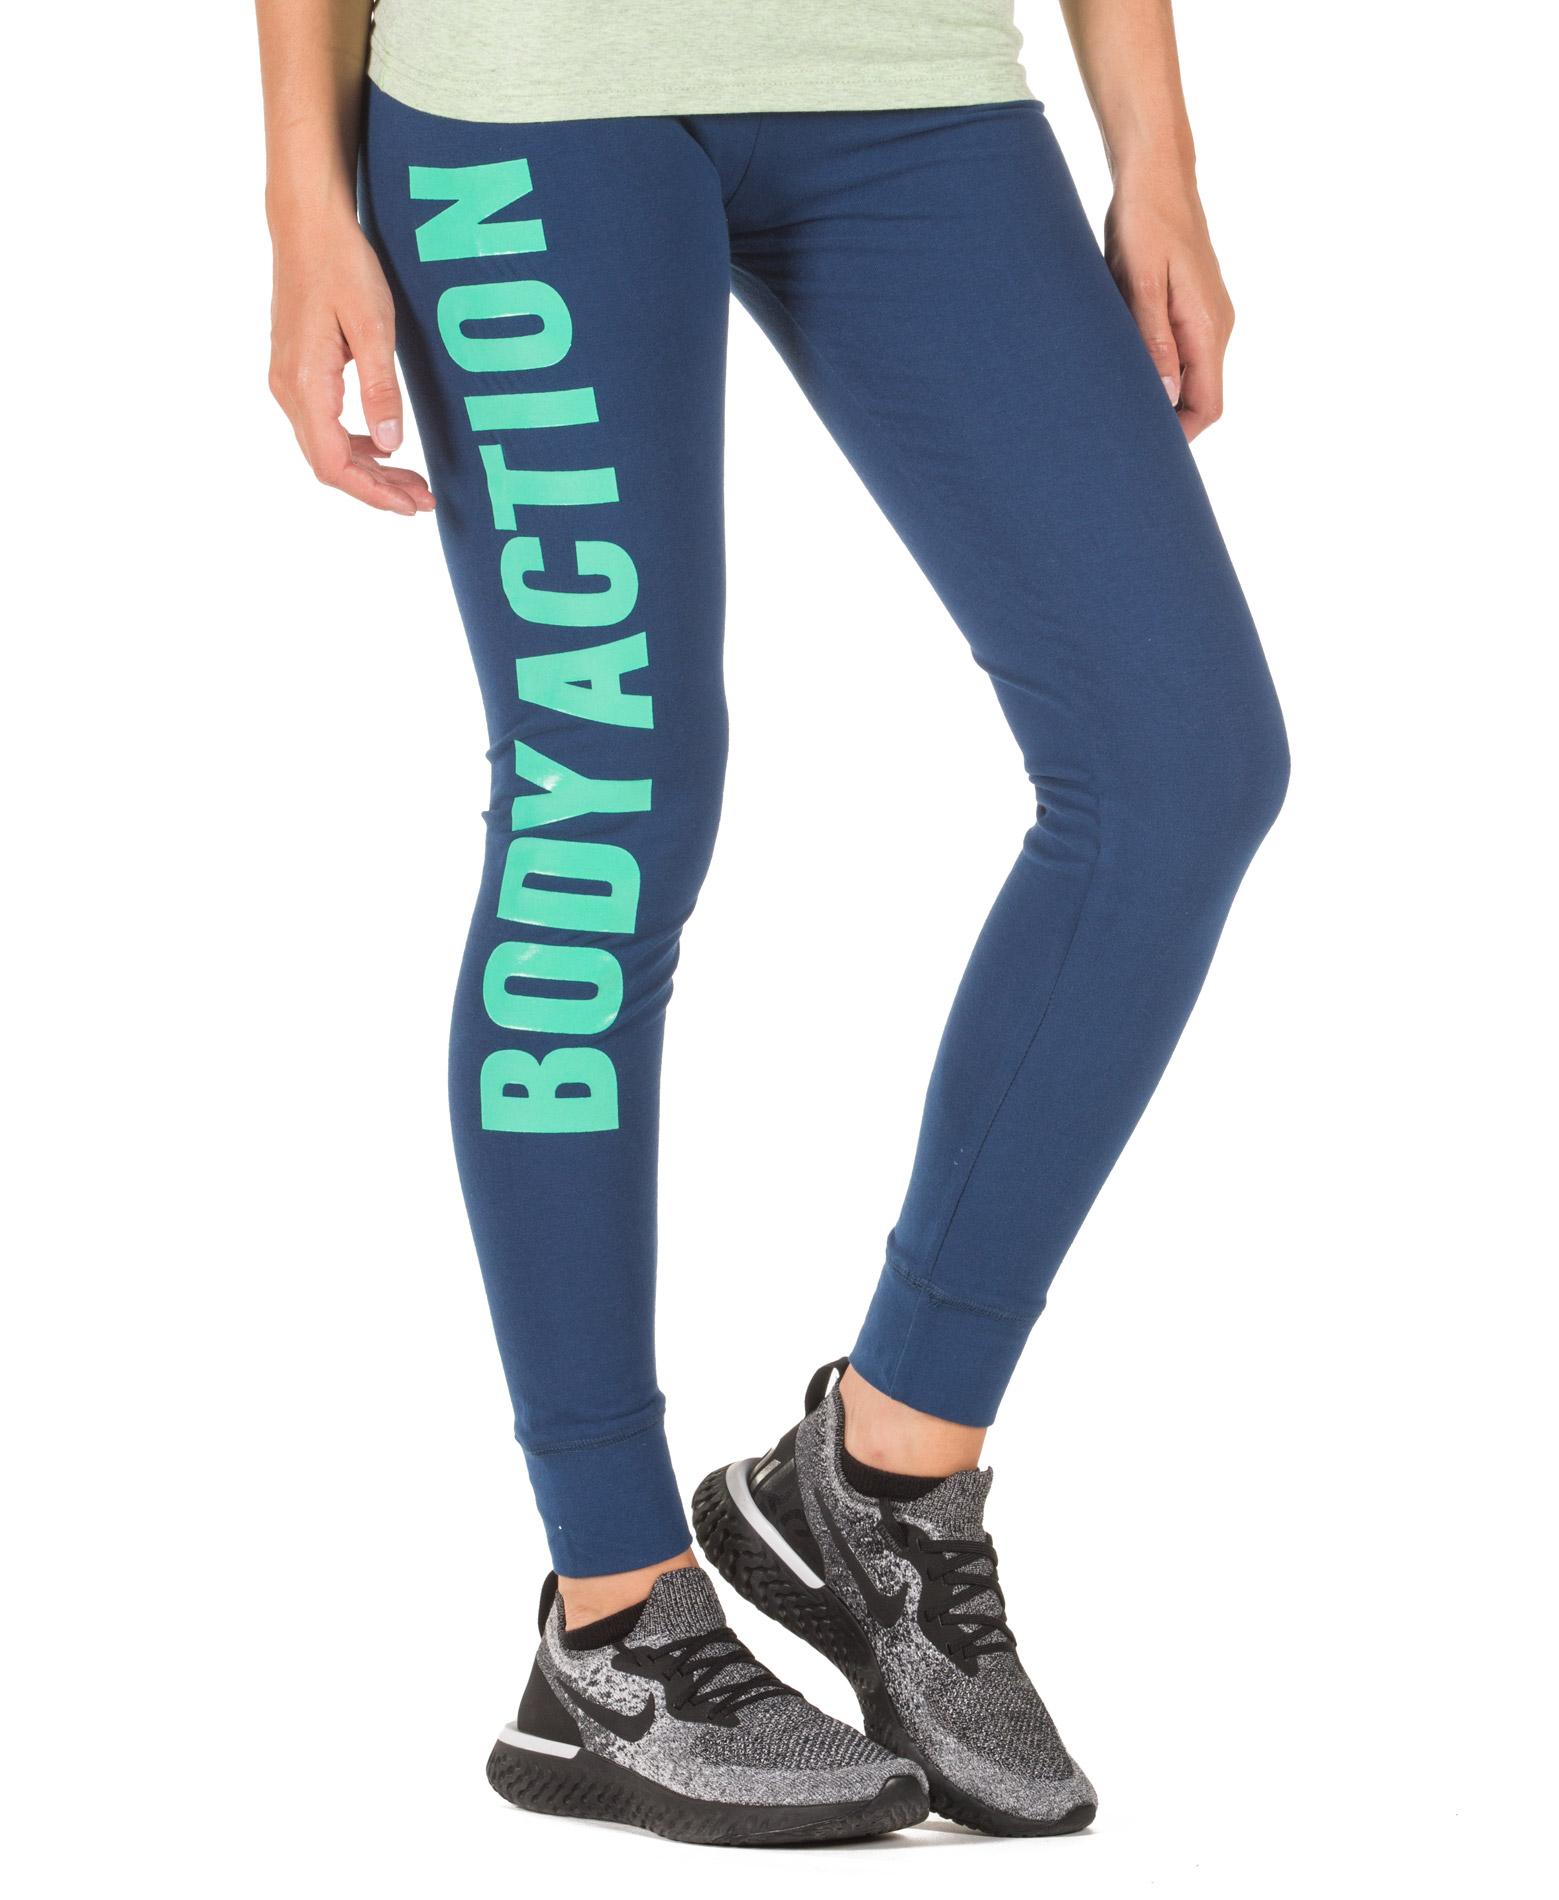 BODY ACTION 011610-01-04K Μπλε